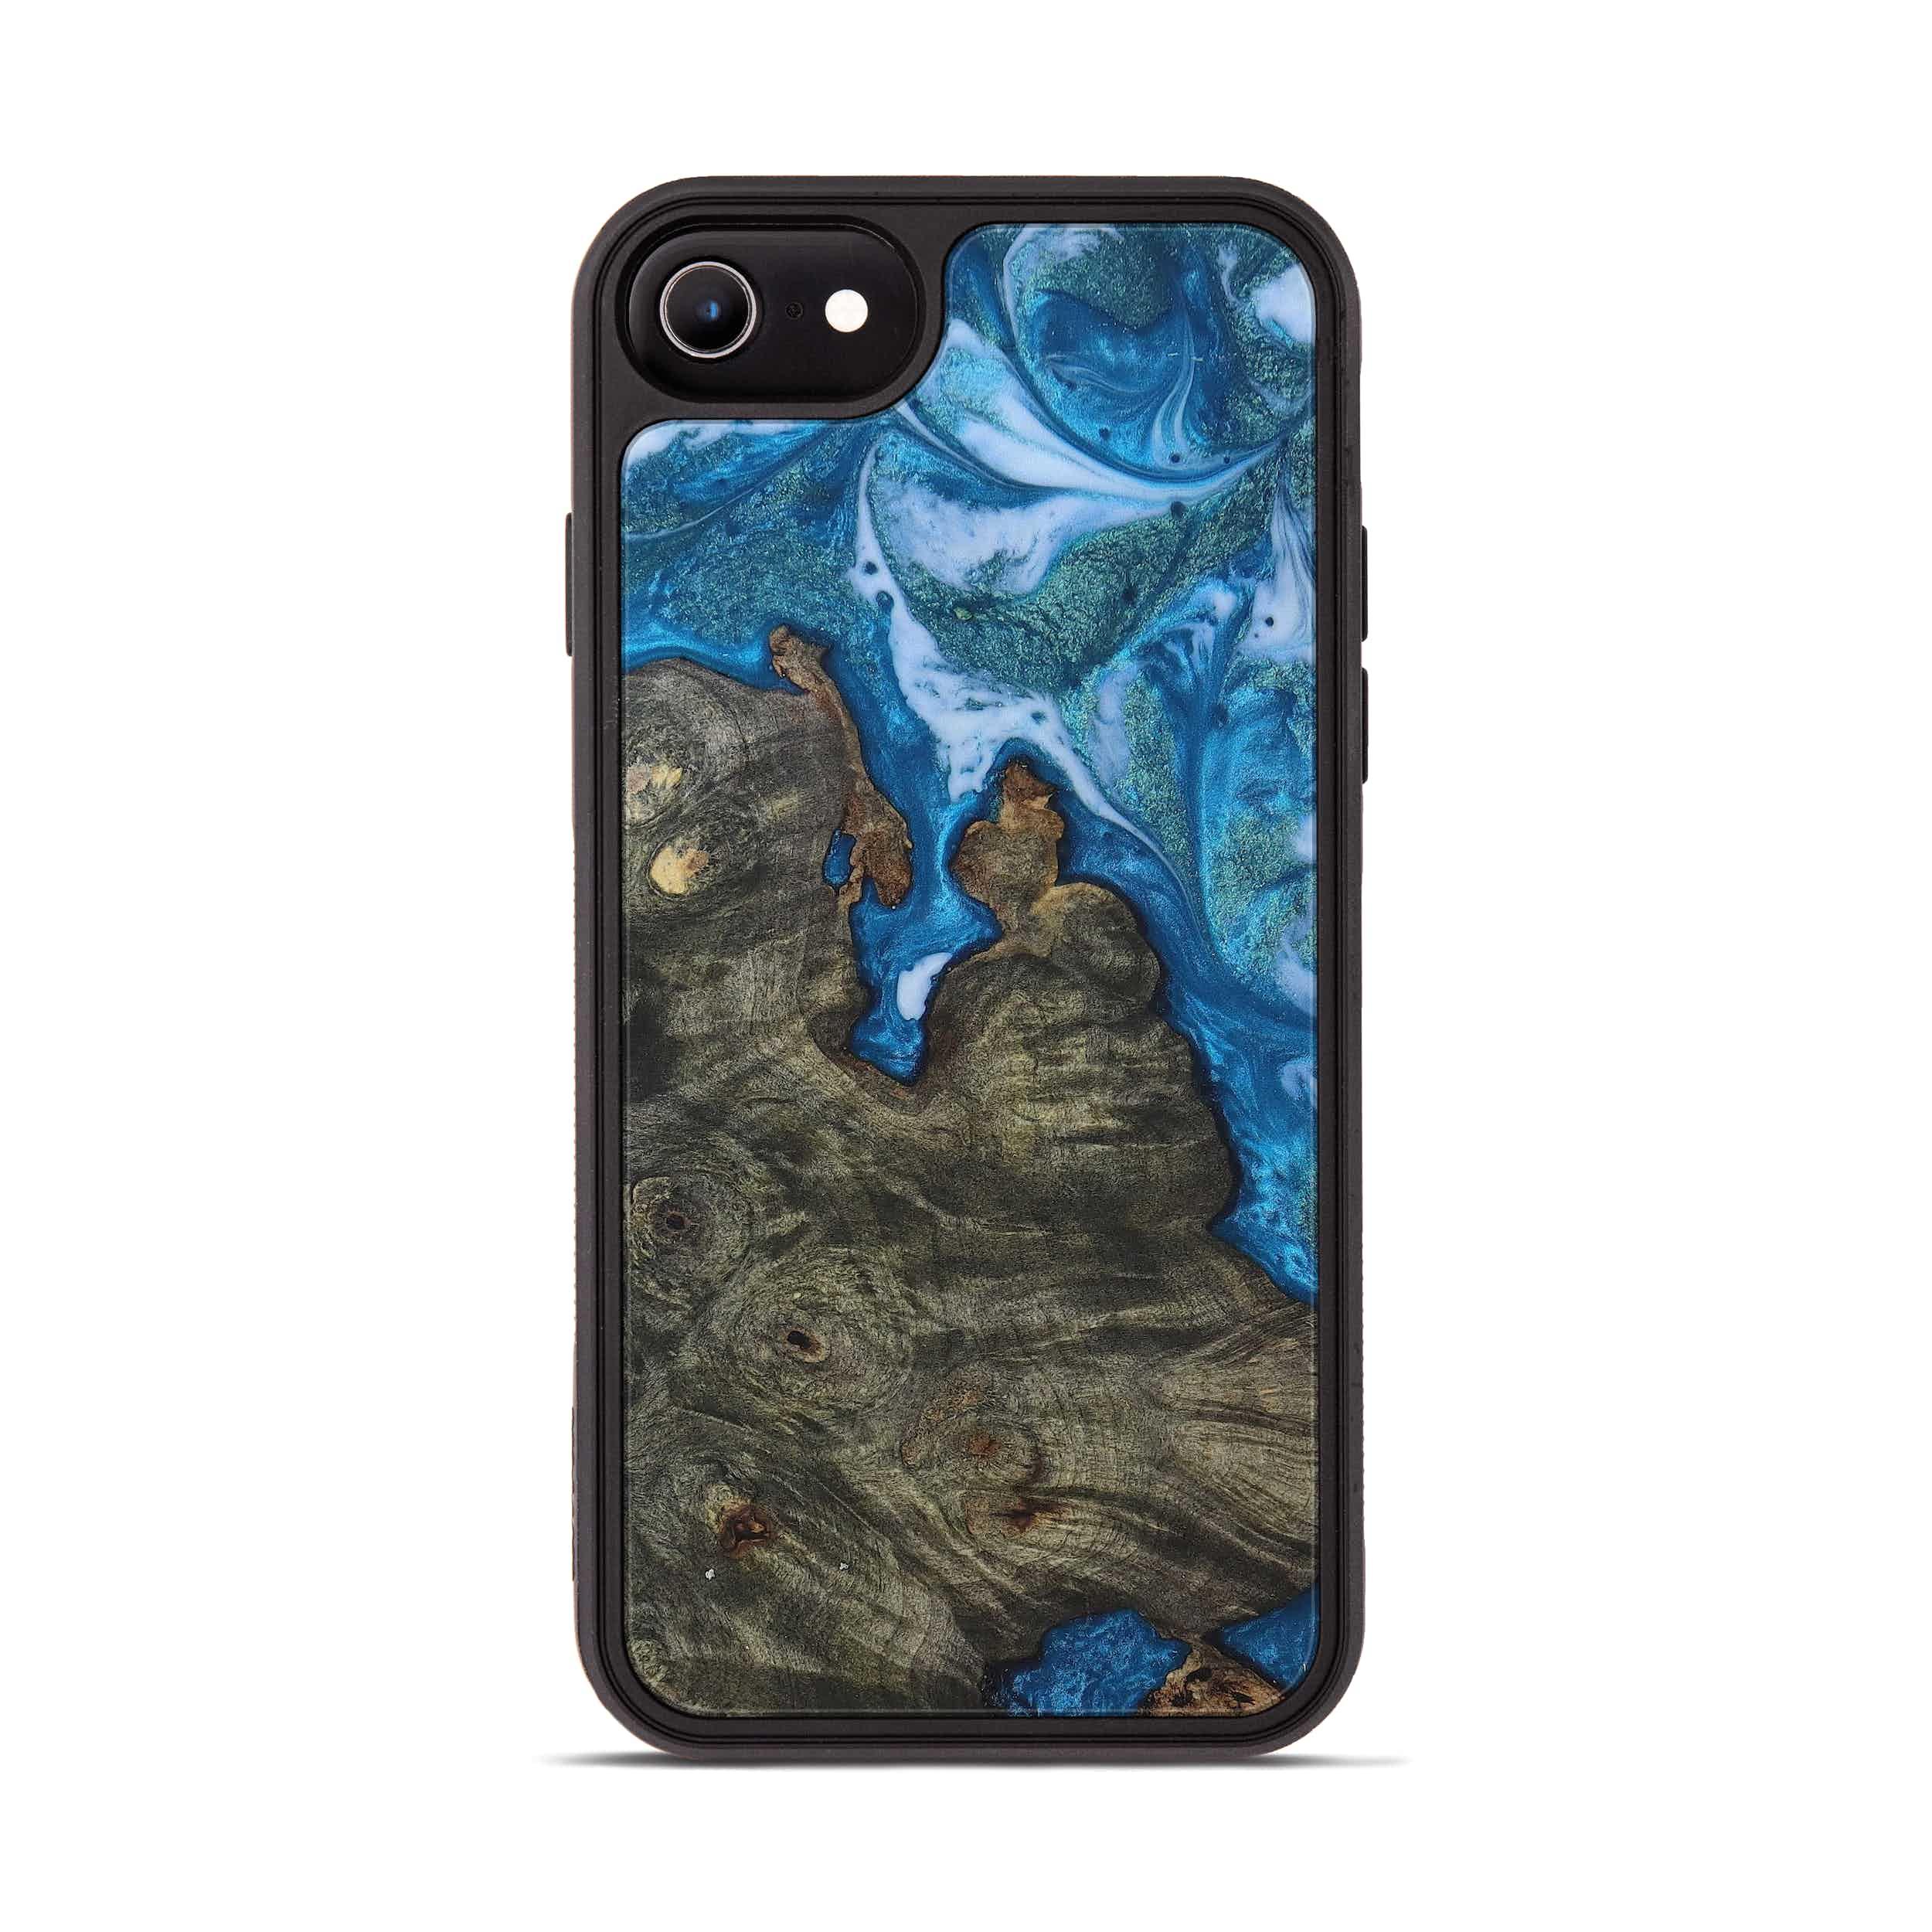 iPhone 8 Wood+Resin Phone Case - Hoekstra (Light Blue, 394824)